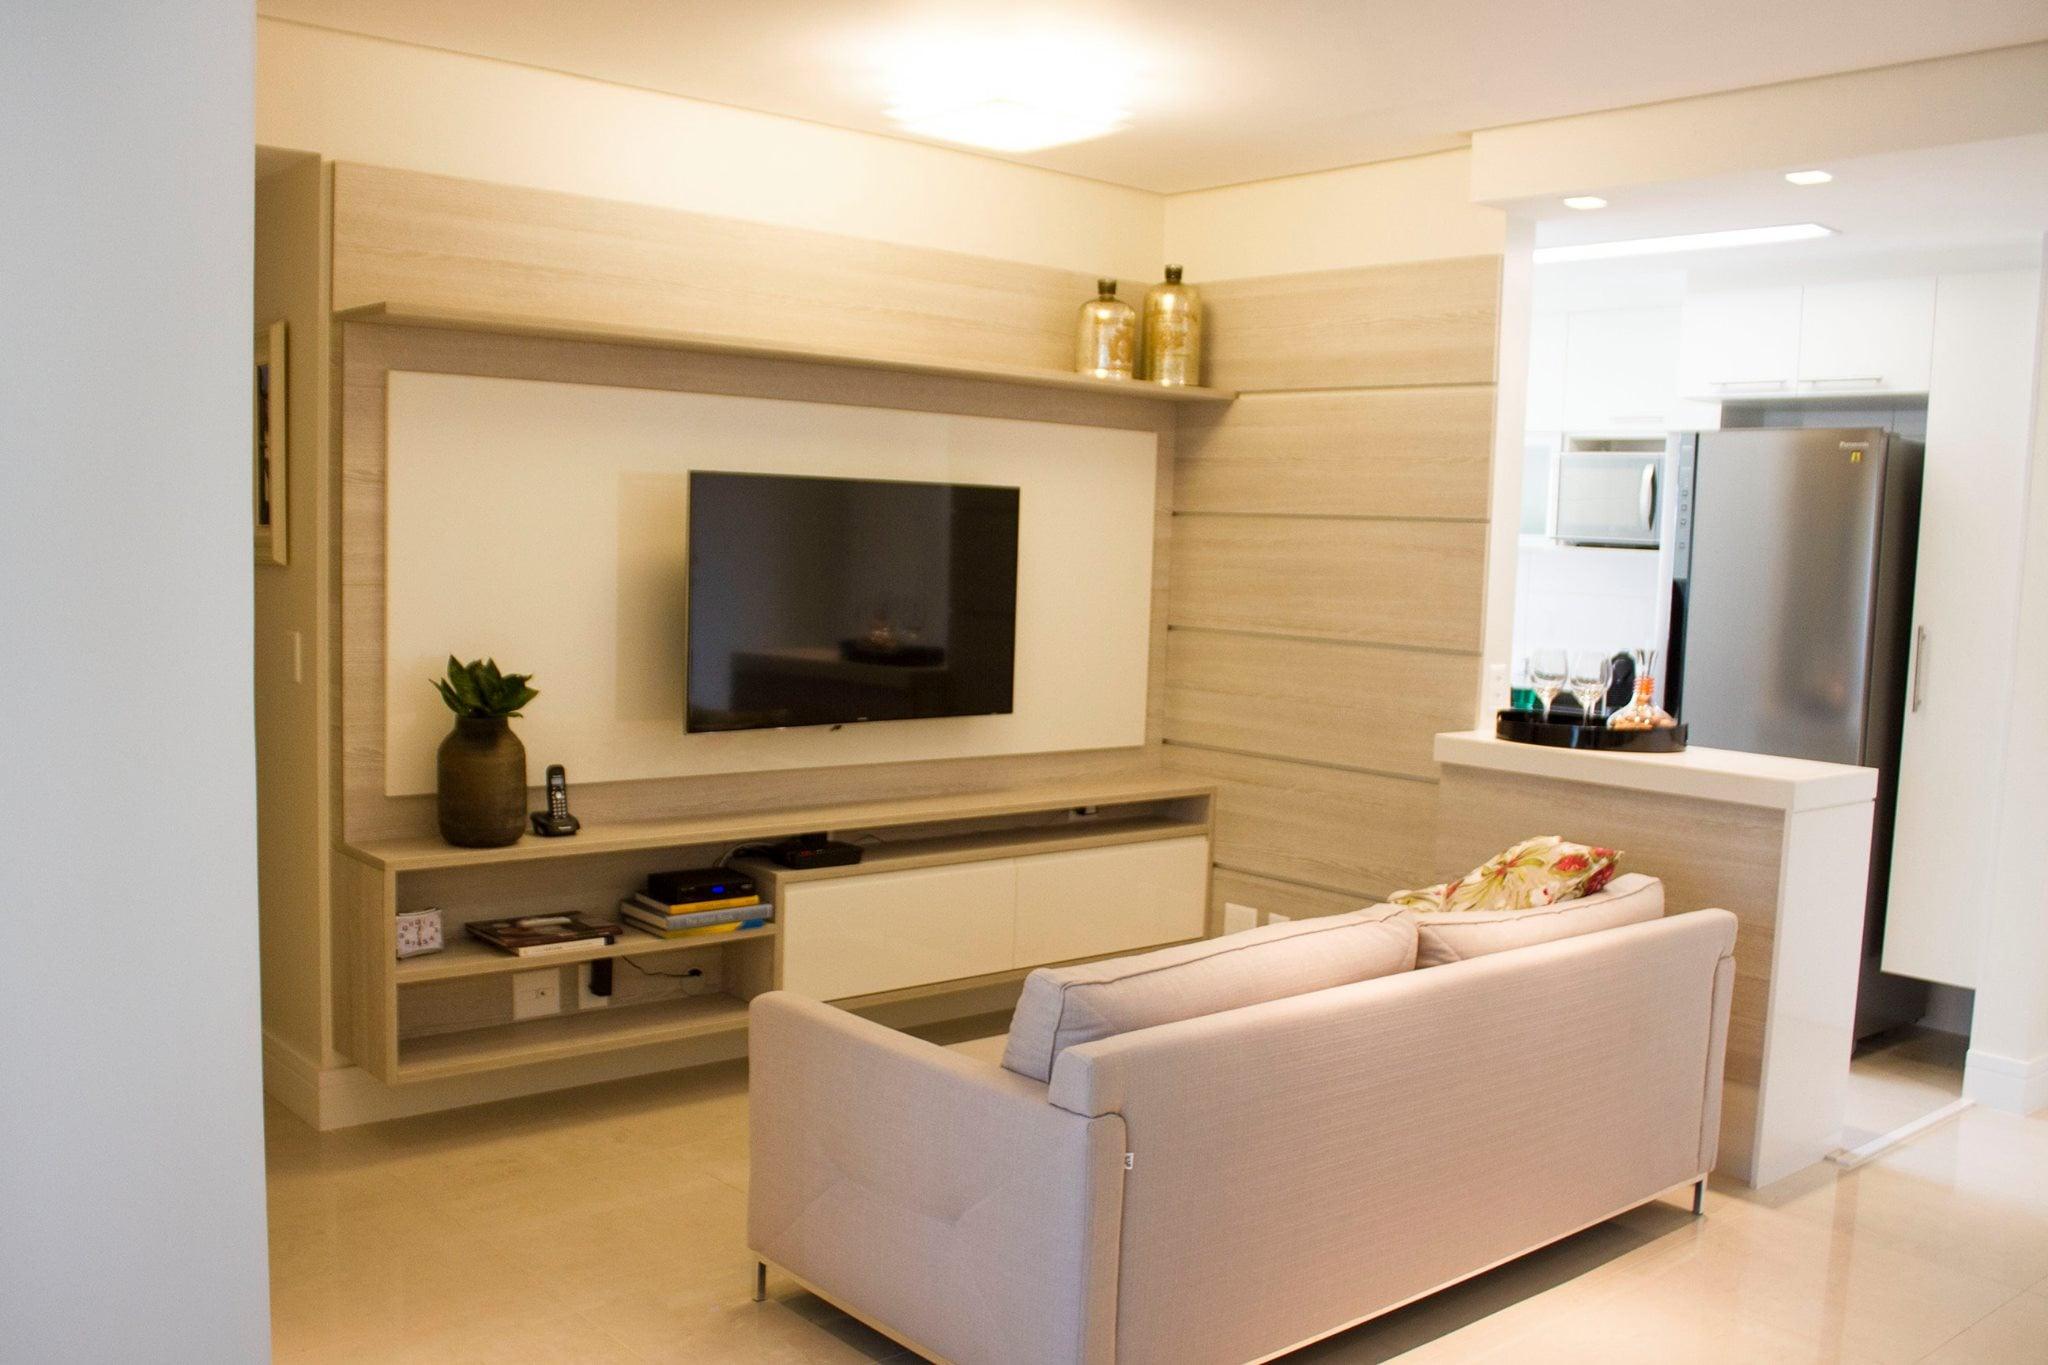 1-Apartamento no Recreio dos Bandeirantes - Arquiteta Carla Del Grande